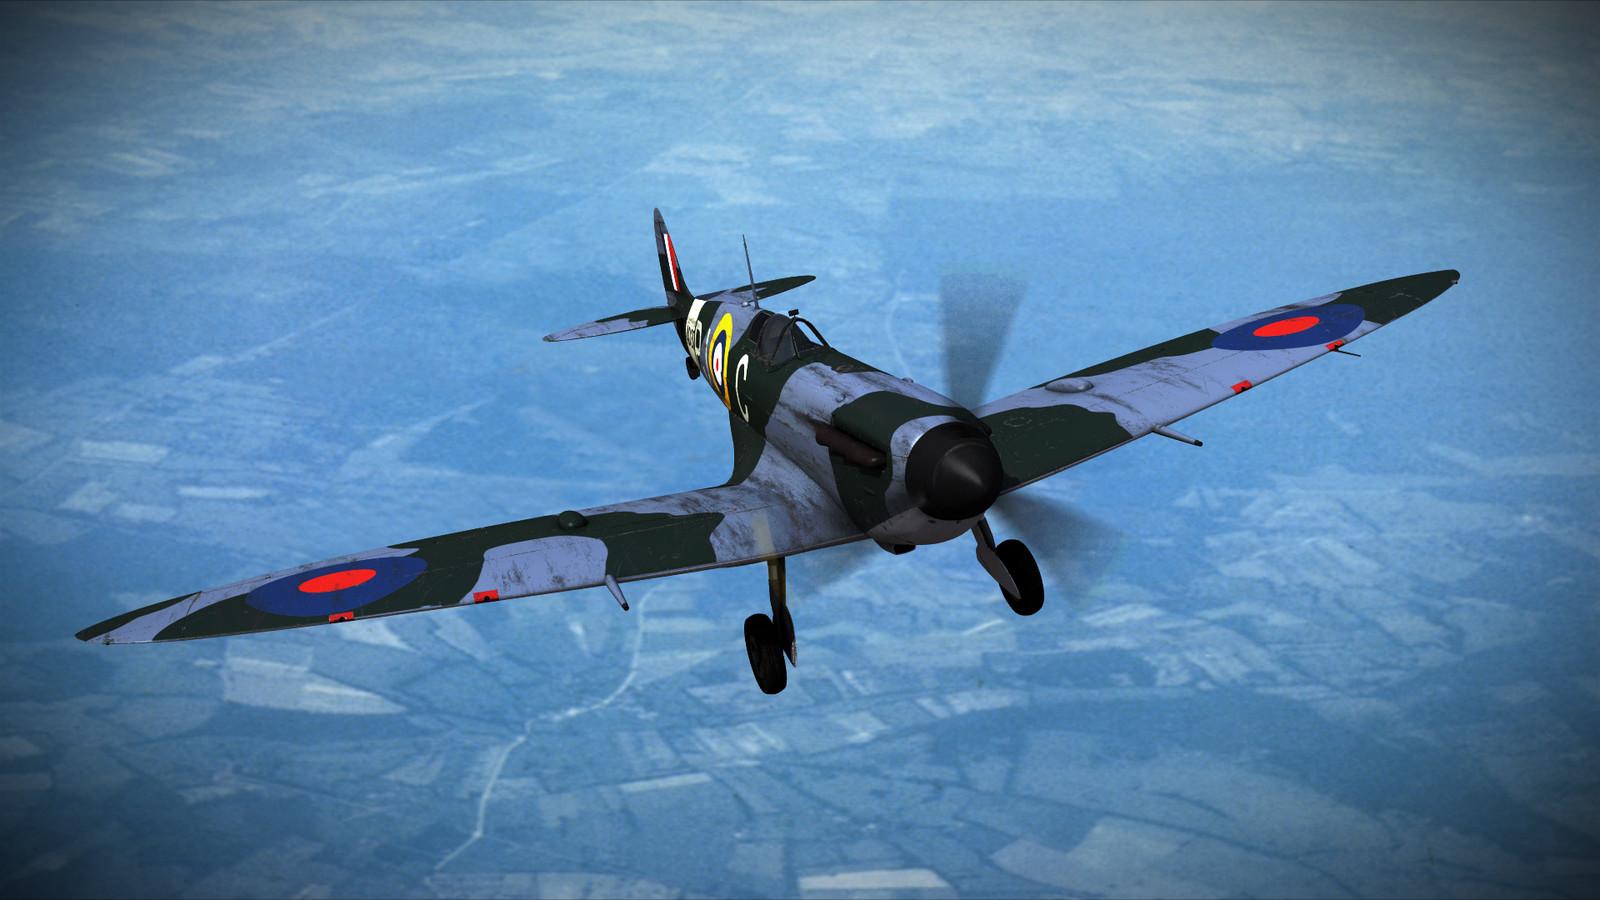 SUPERMARINE SPITFIRE MK-VB 130th Squadron